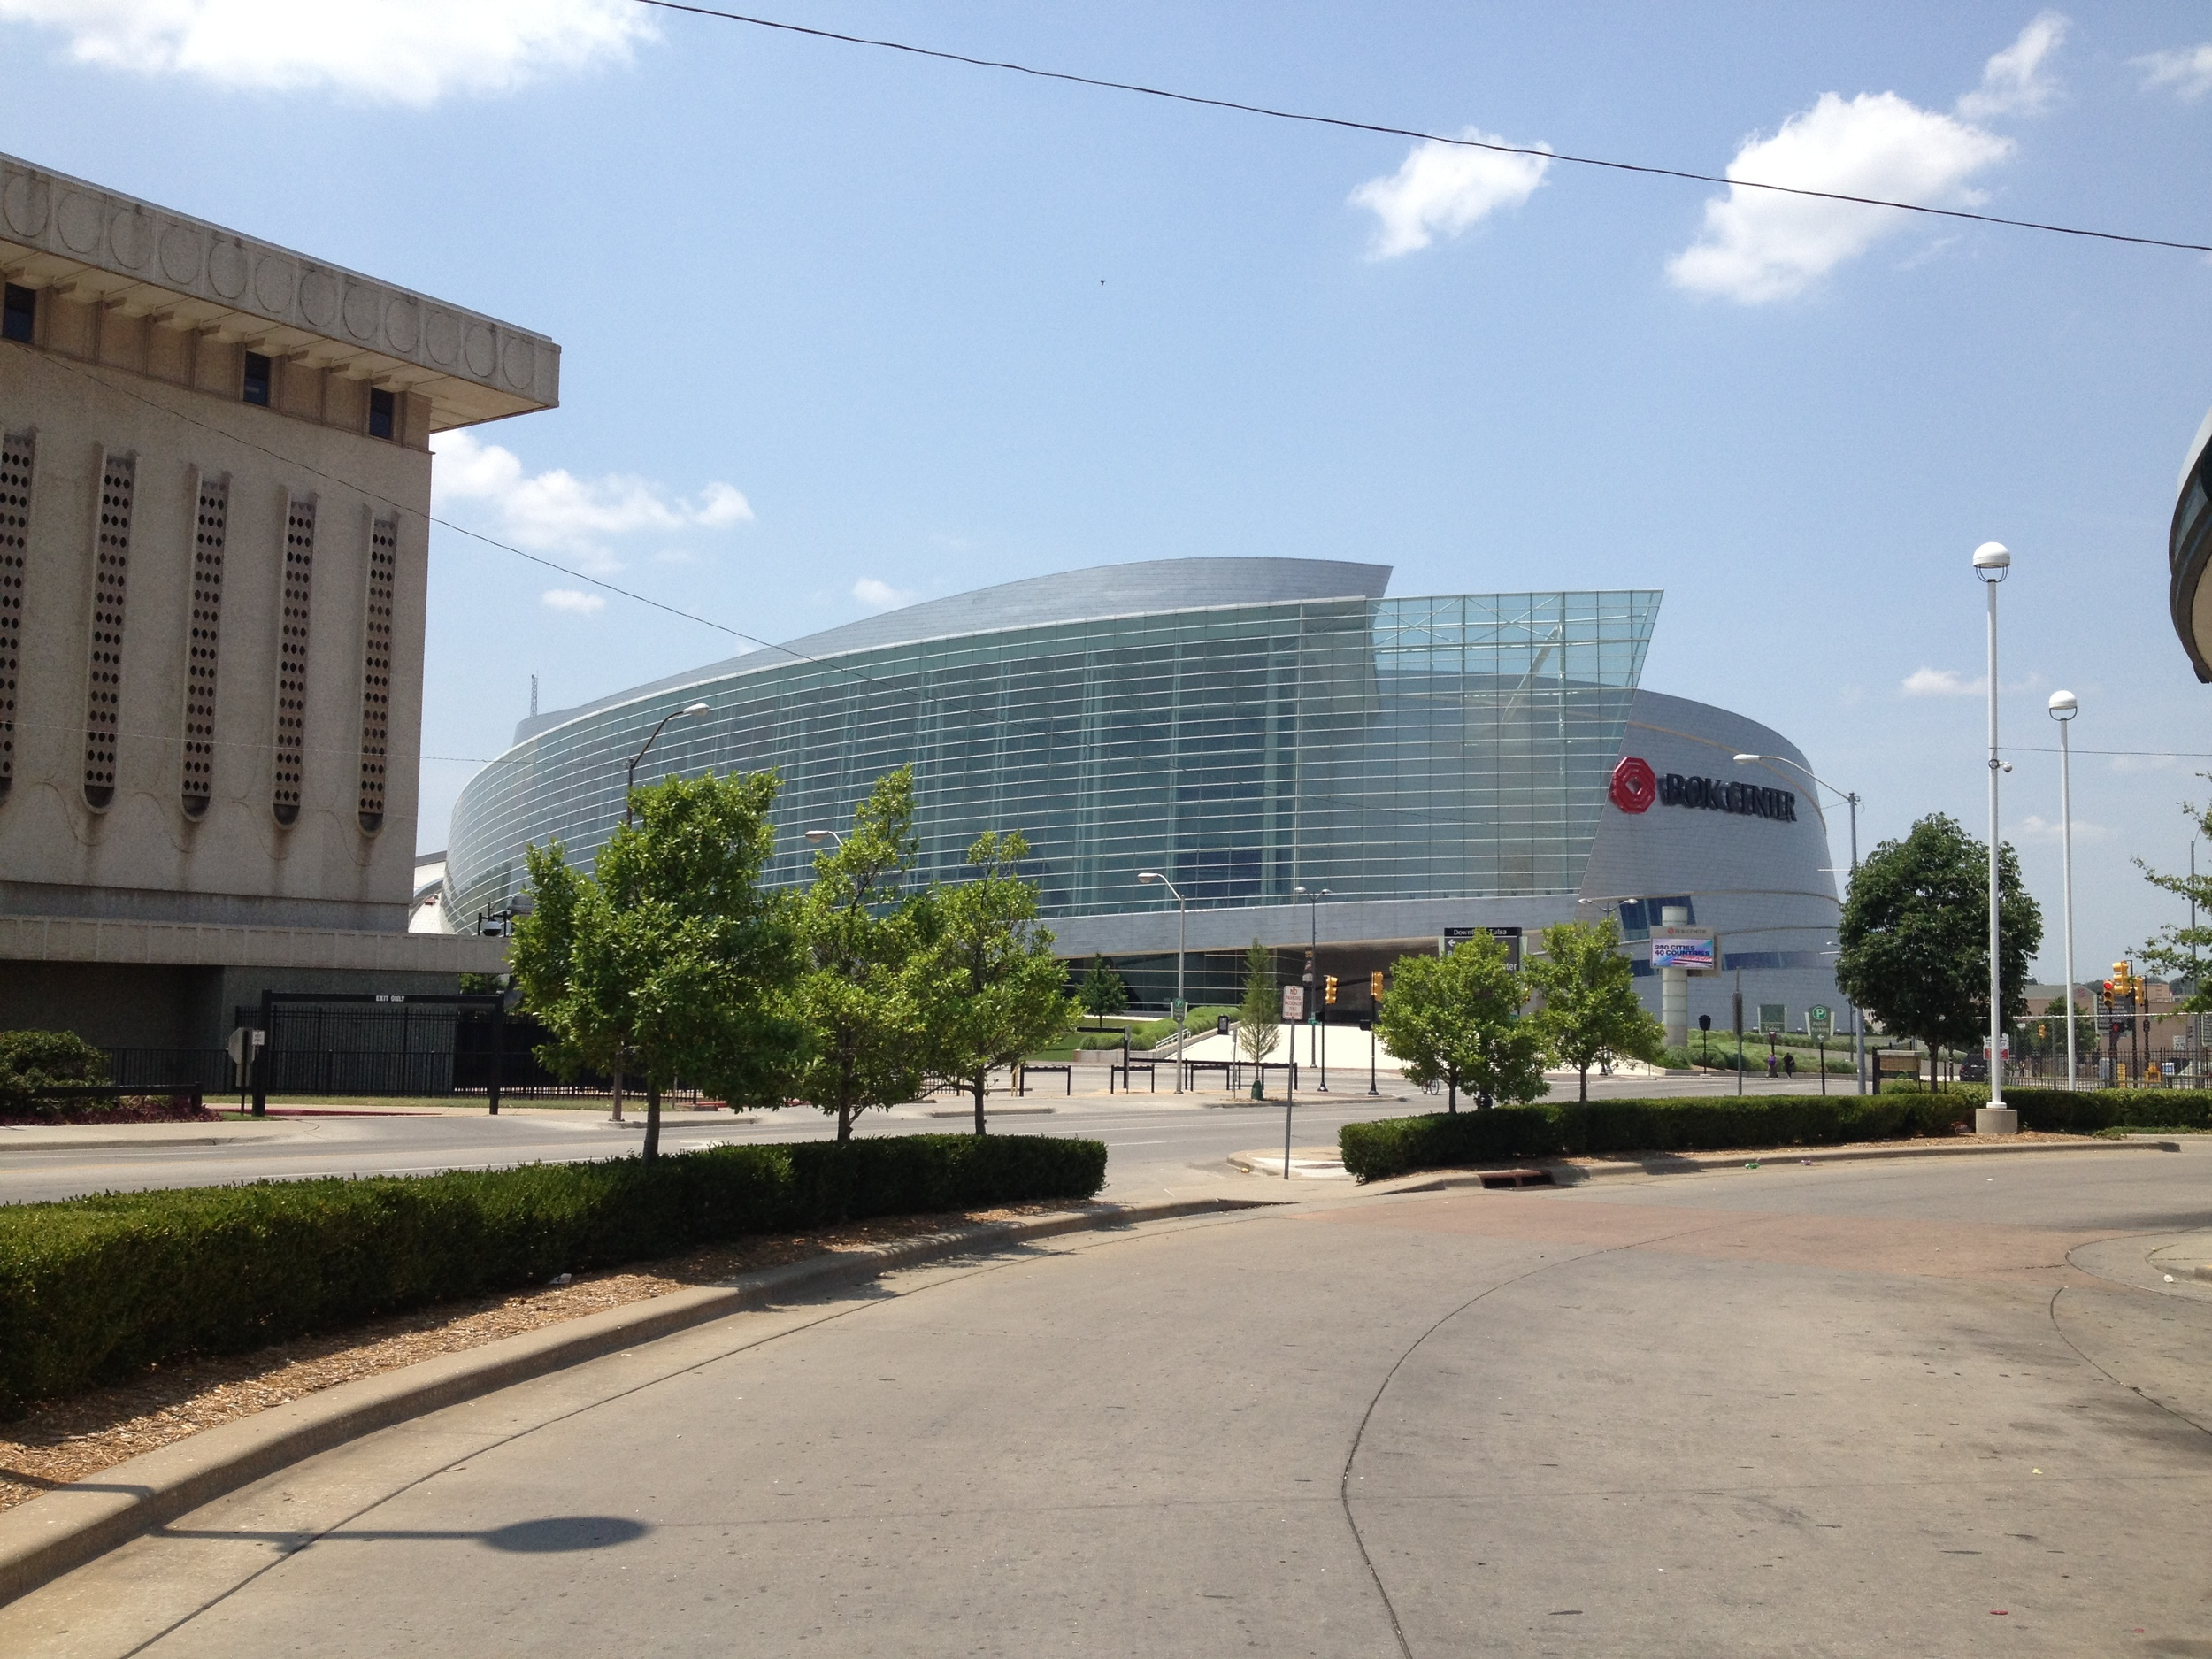 The BOK Center in Tulsa